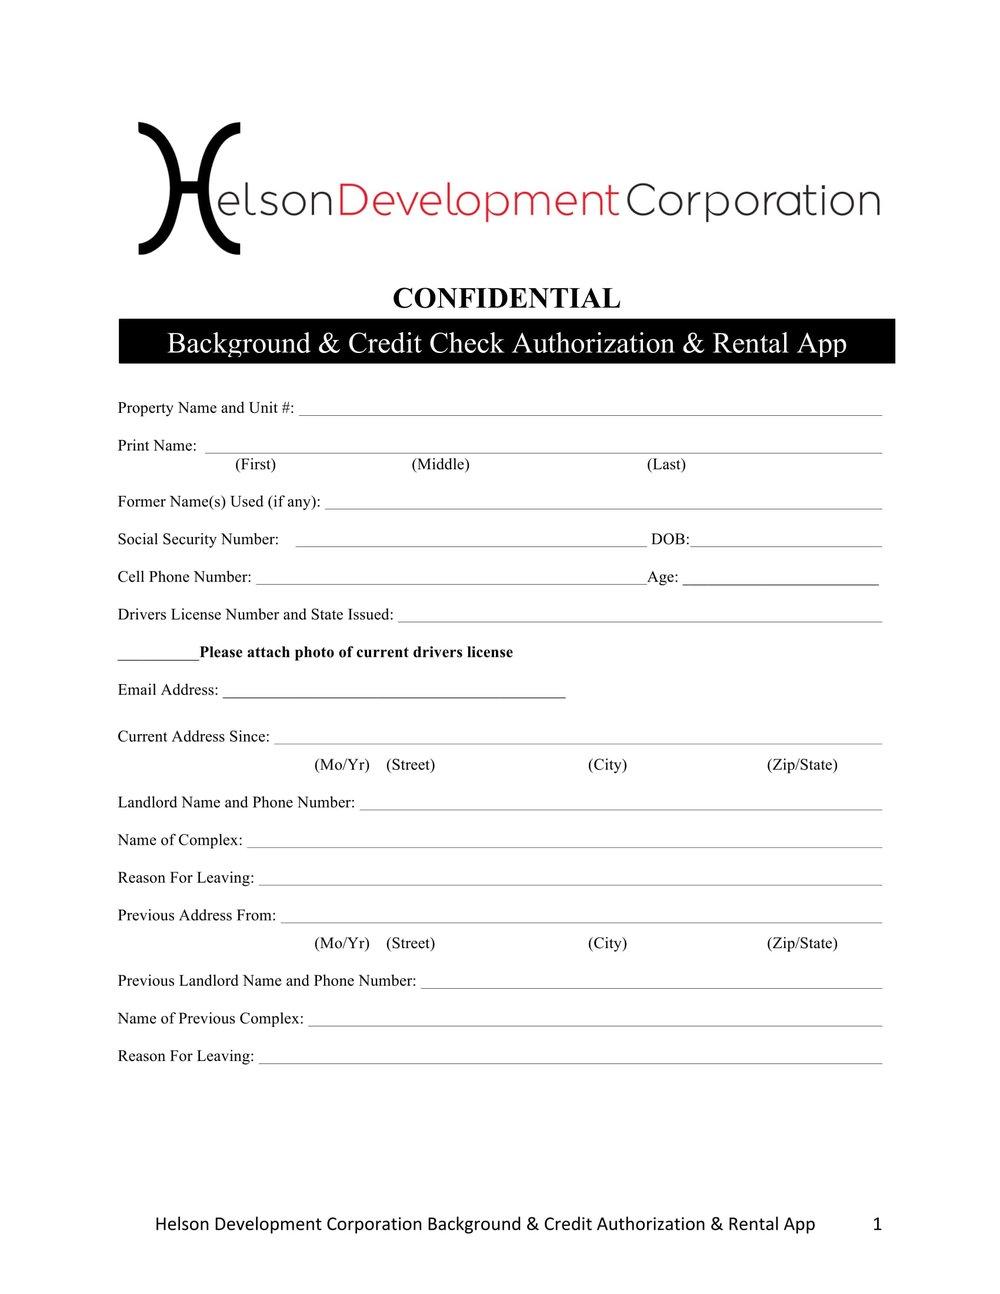 HDC Background & Credit Authorization & Rental App-1.jpg